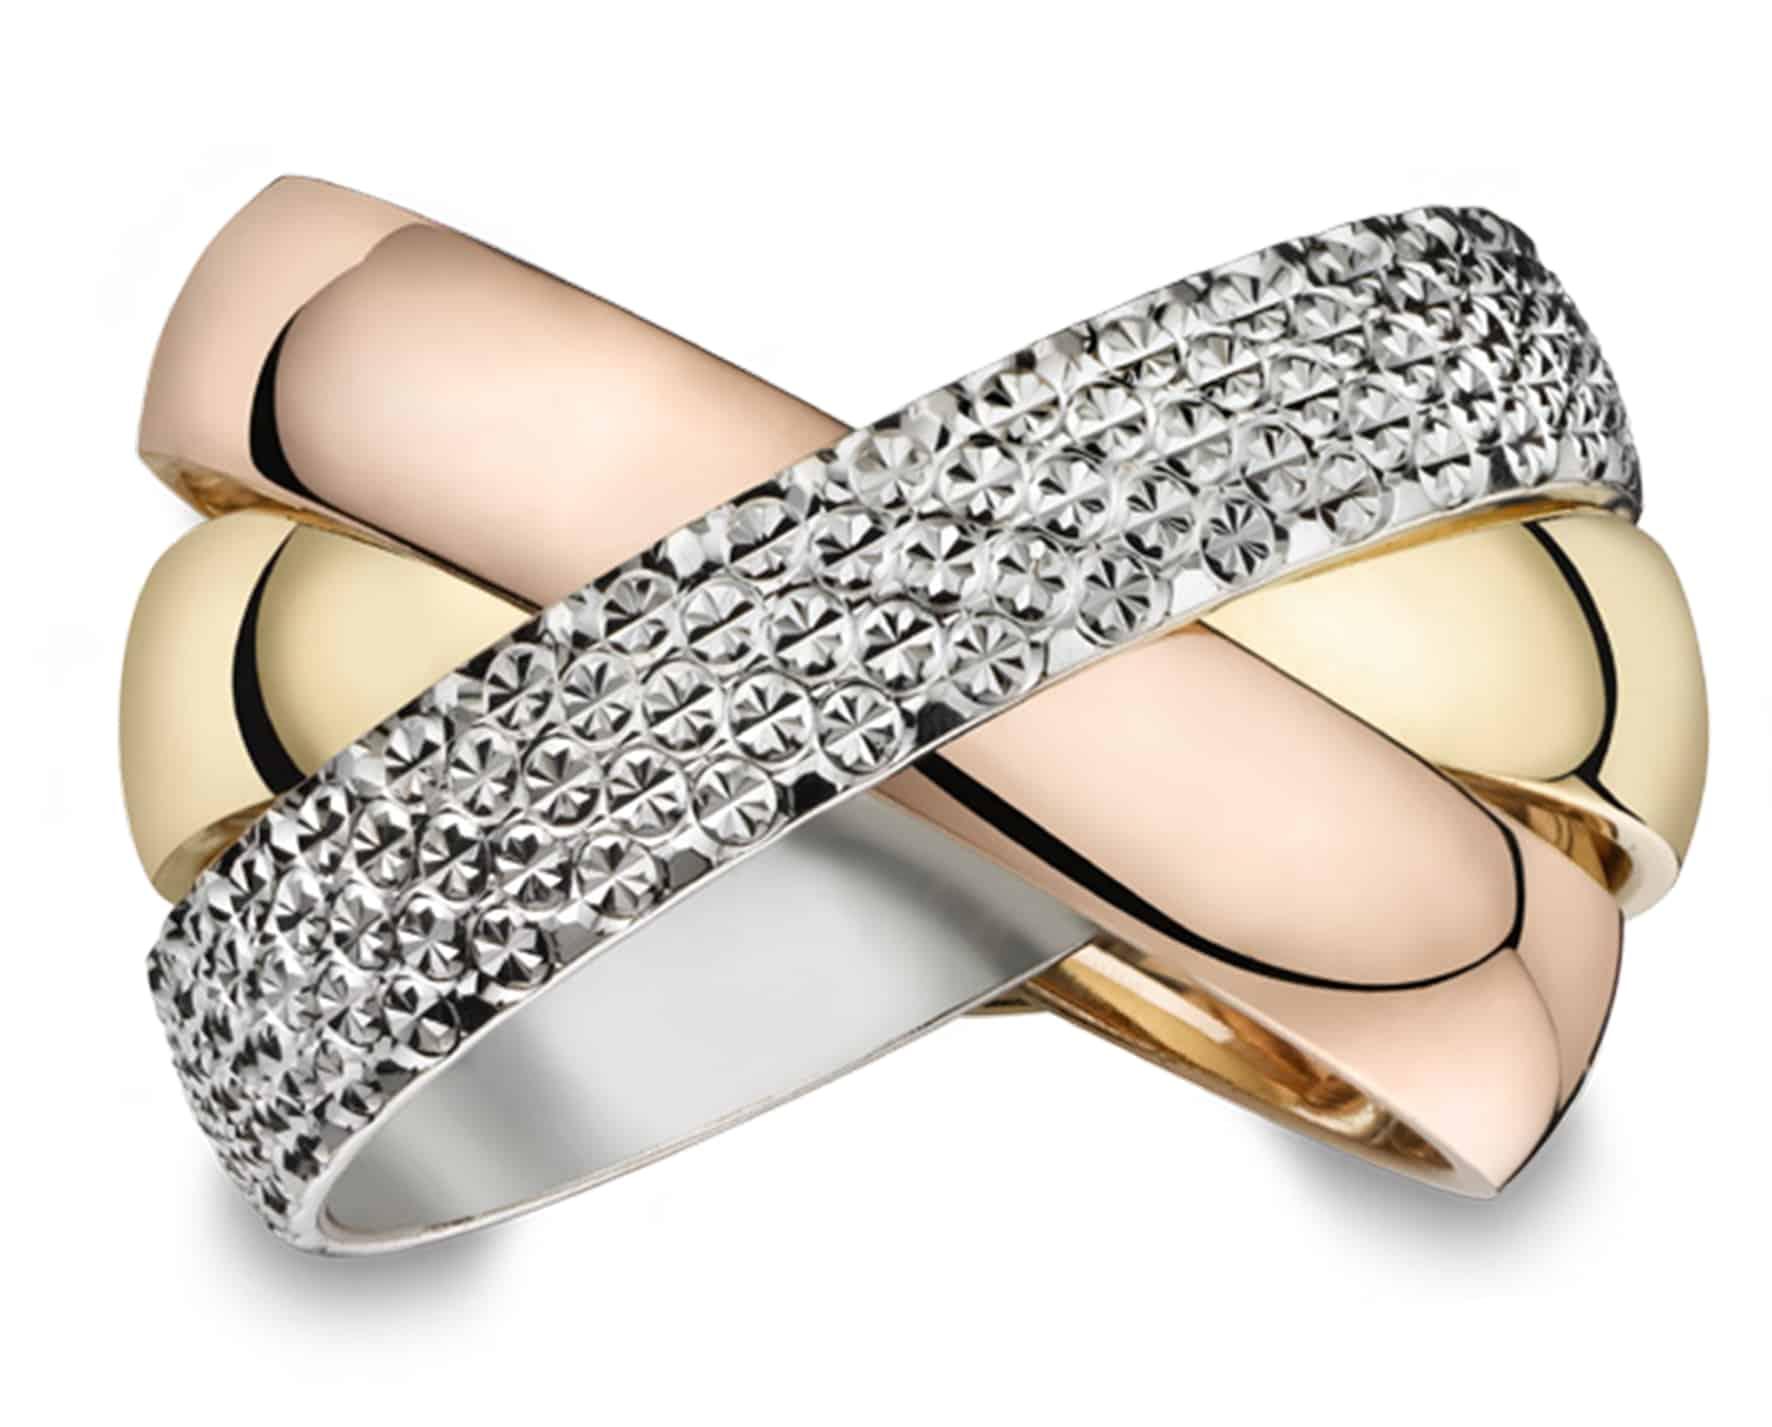 Klassieke Trouwringen Goud Titanium Diamant - tricolor wit geel en rood goud